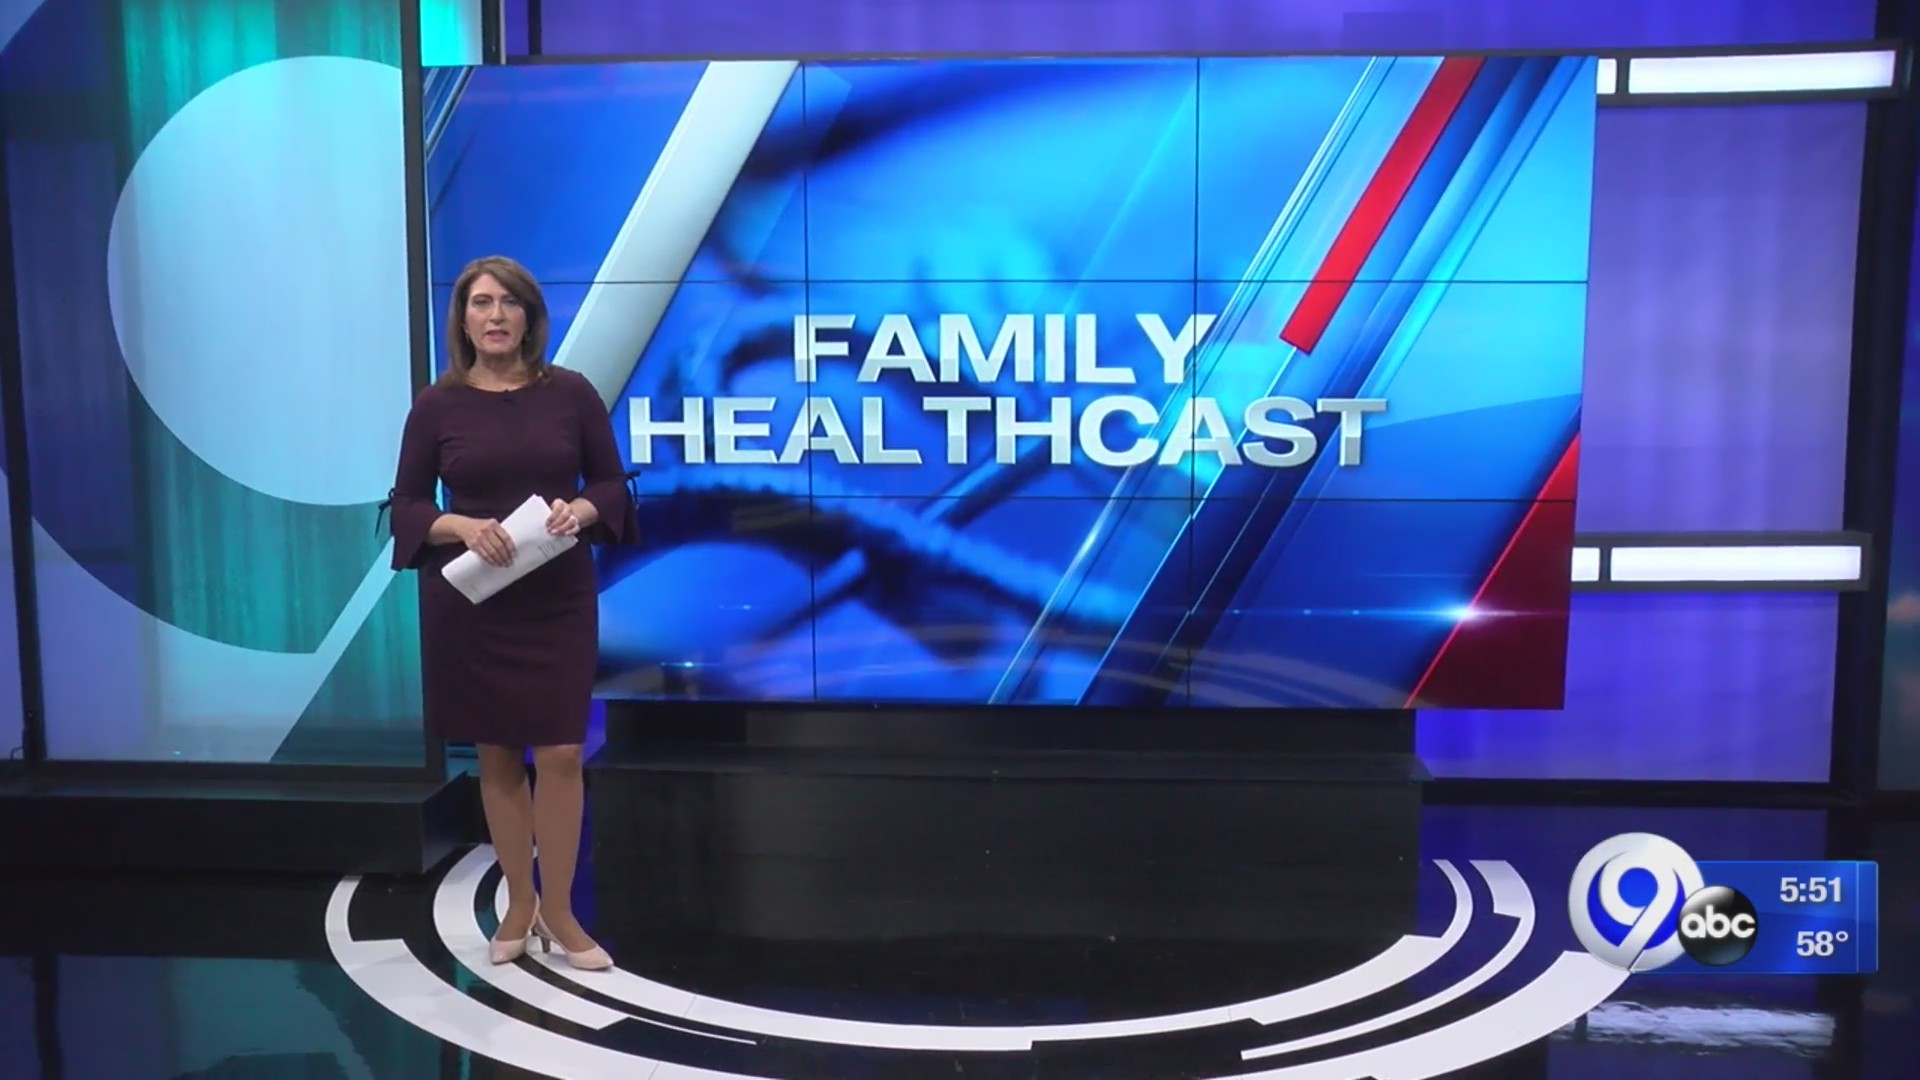 Family_Healthcast__5_28_19_0_20190528215709